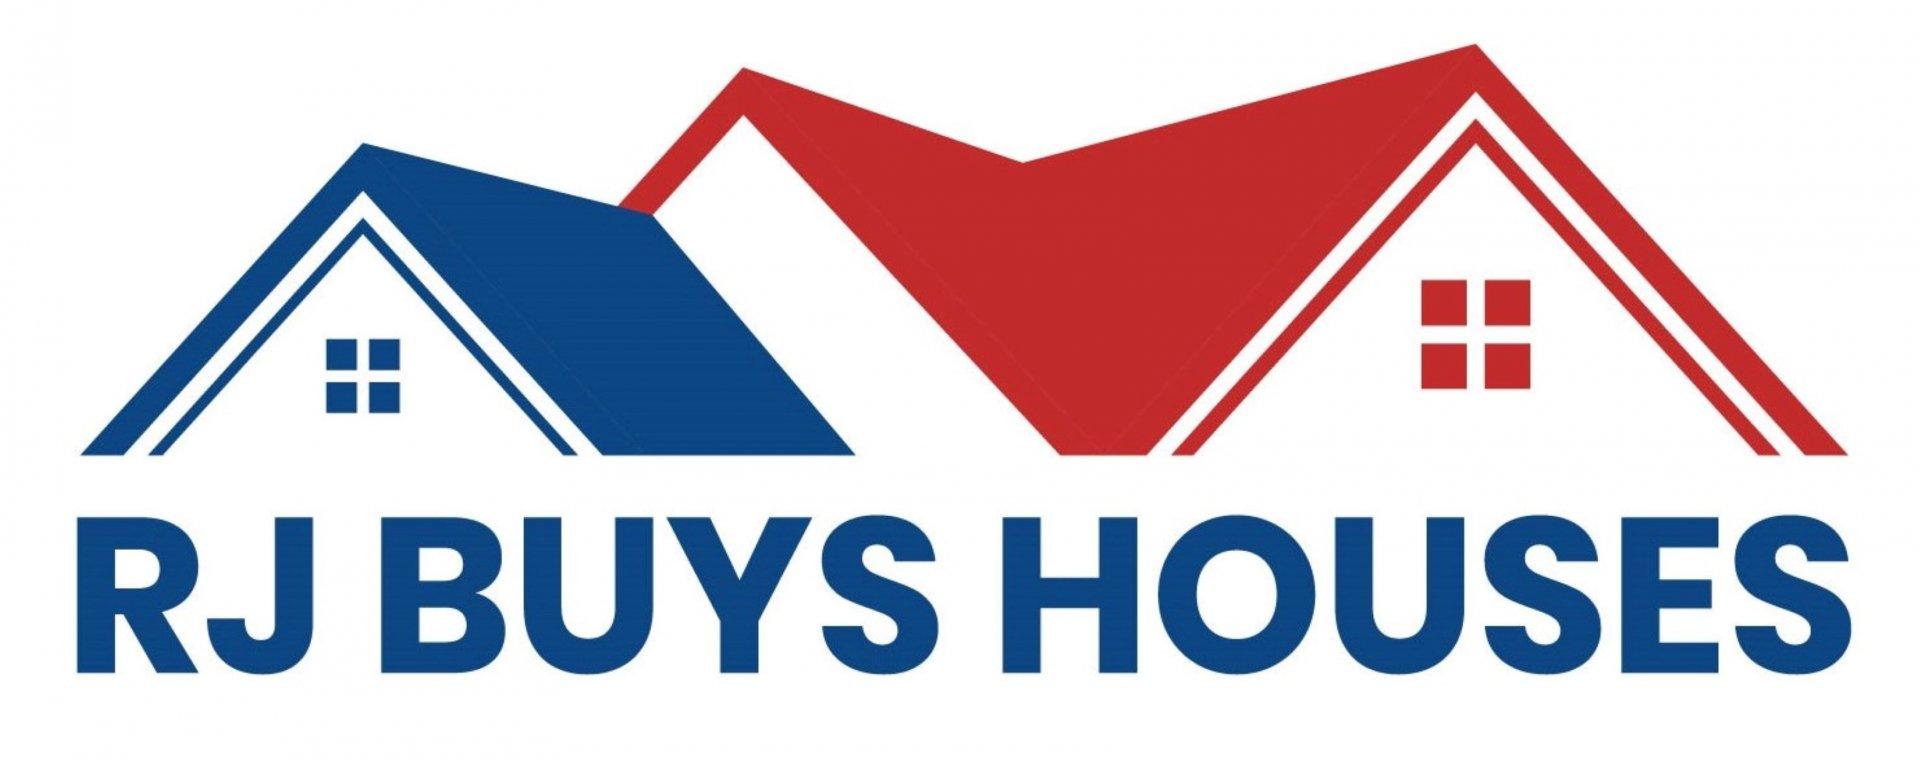 RJ Buys Houses logo